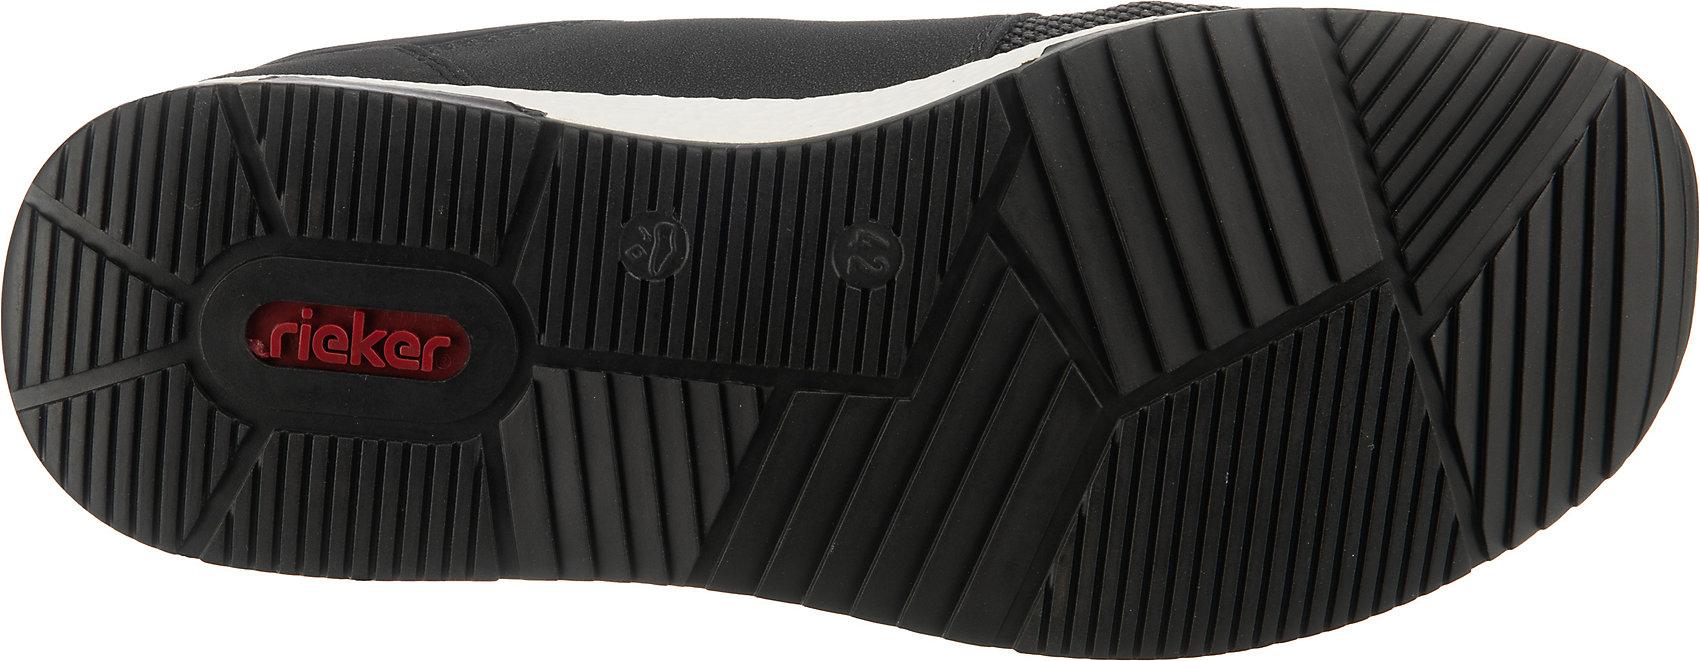 Indexbild 13 - Neu rieker Sneakers Low 12842477 für Herren schwarz